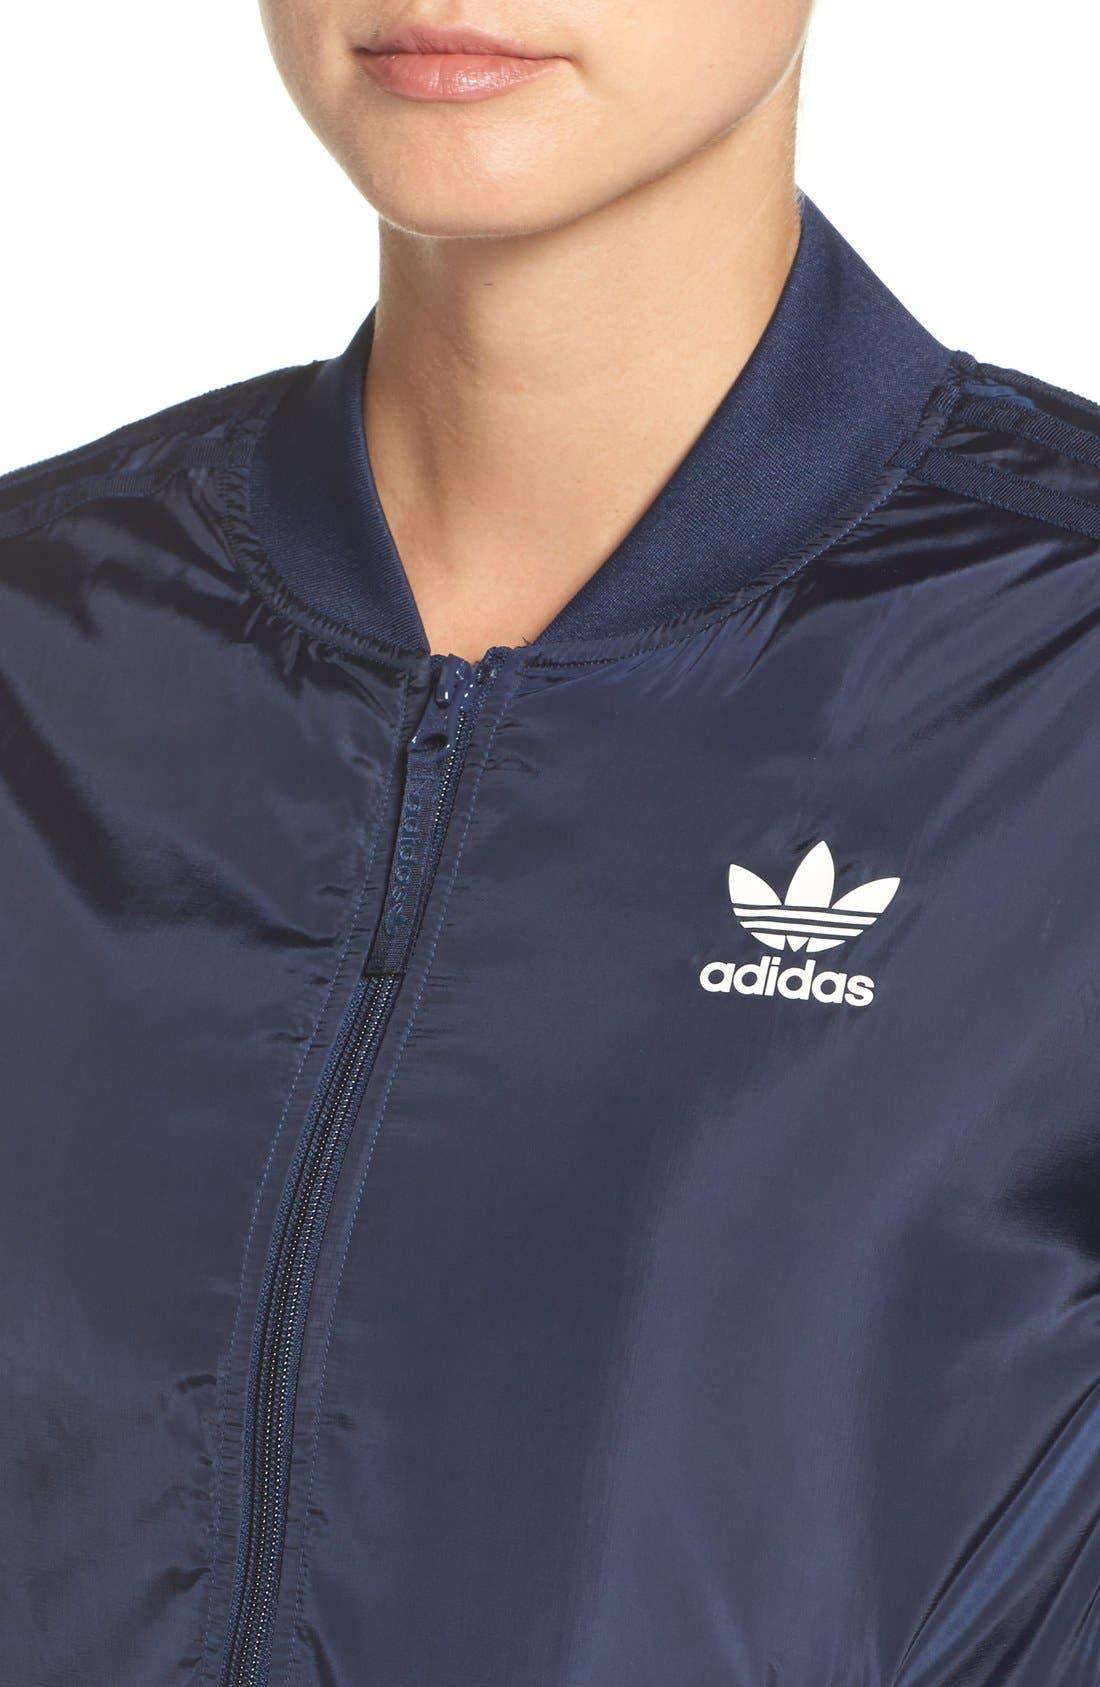 Alternate Image 4  - adidas Originals 'BG' 3-Stripes Bomber Jacket